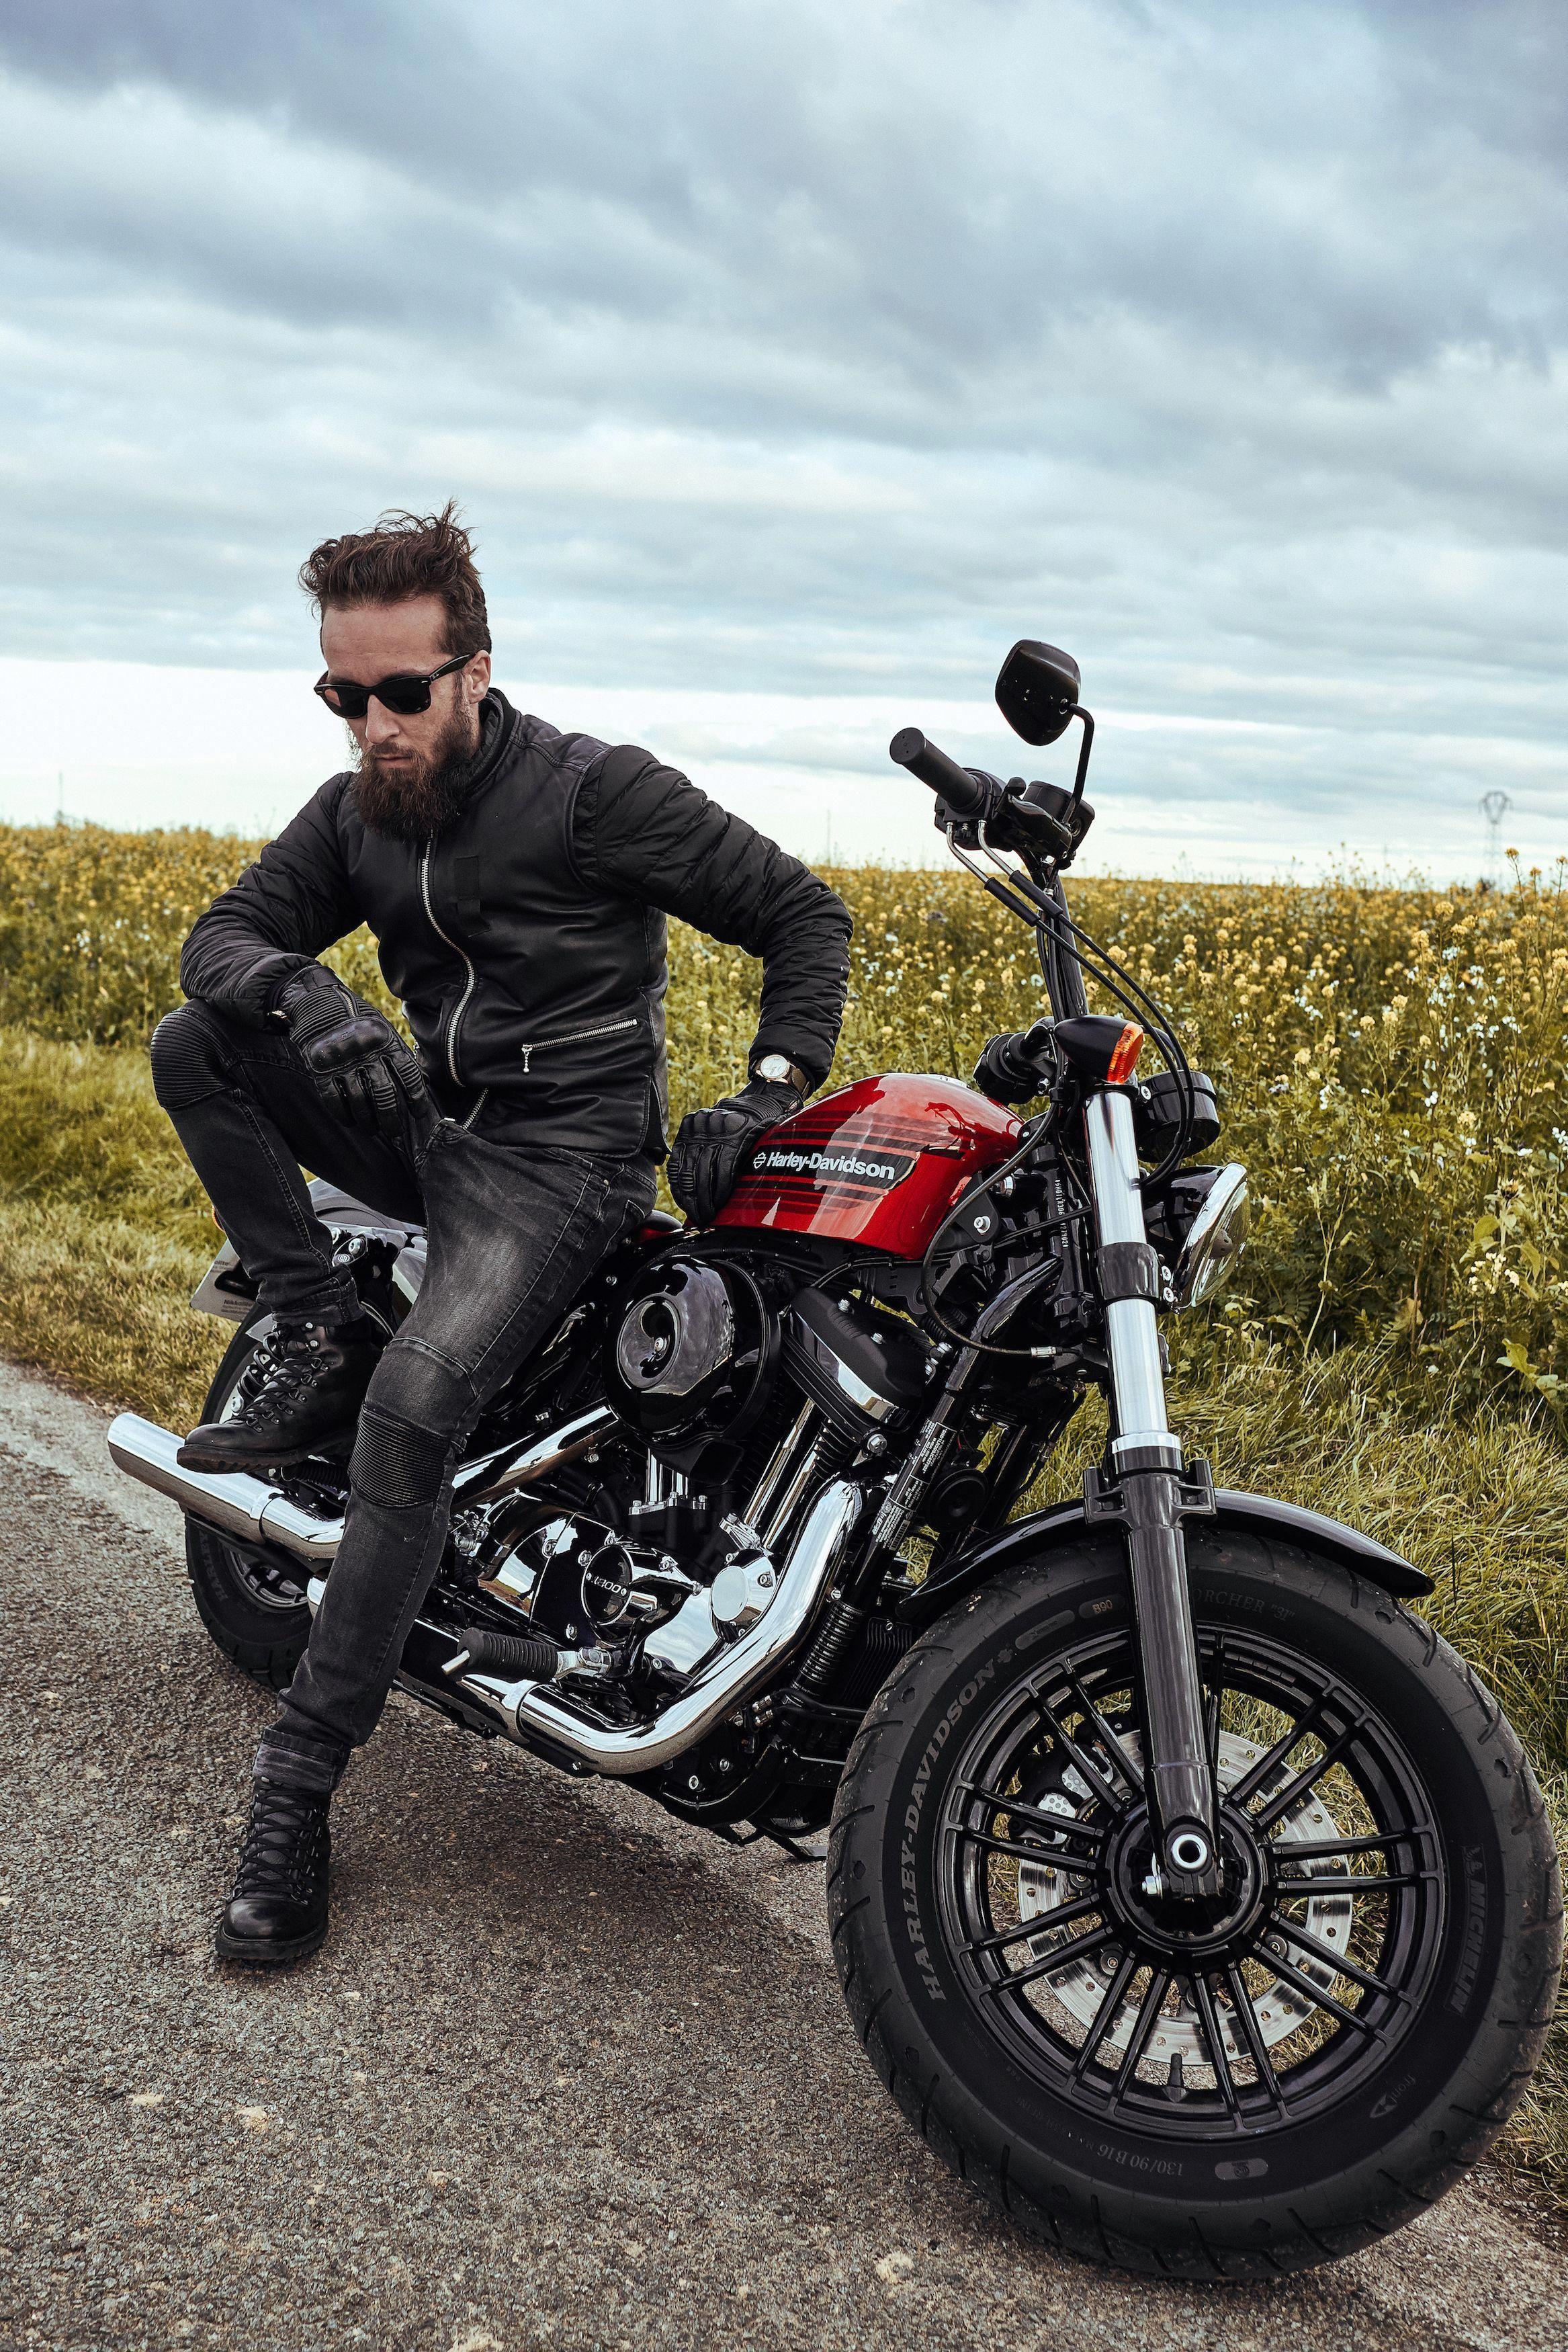 The New Harley Davidson 49 Special 2019 Harleydavidson 1200